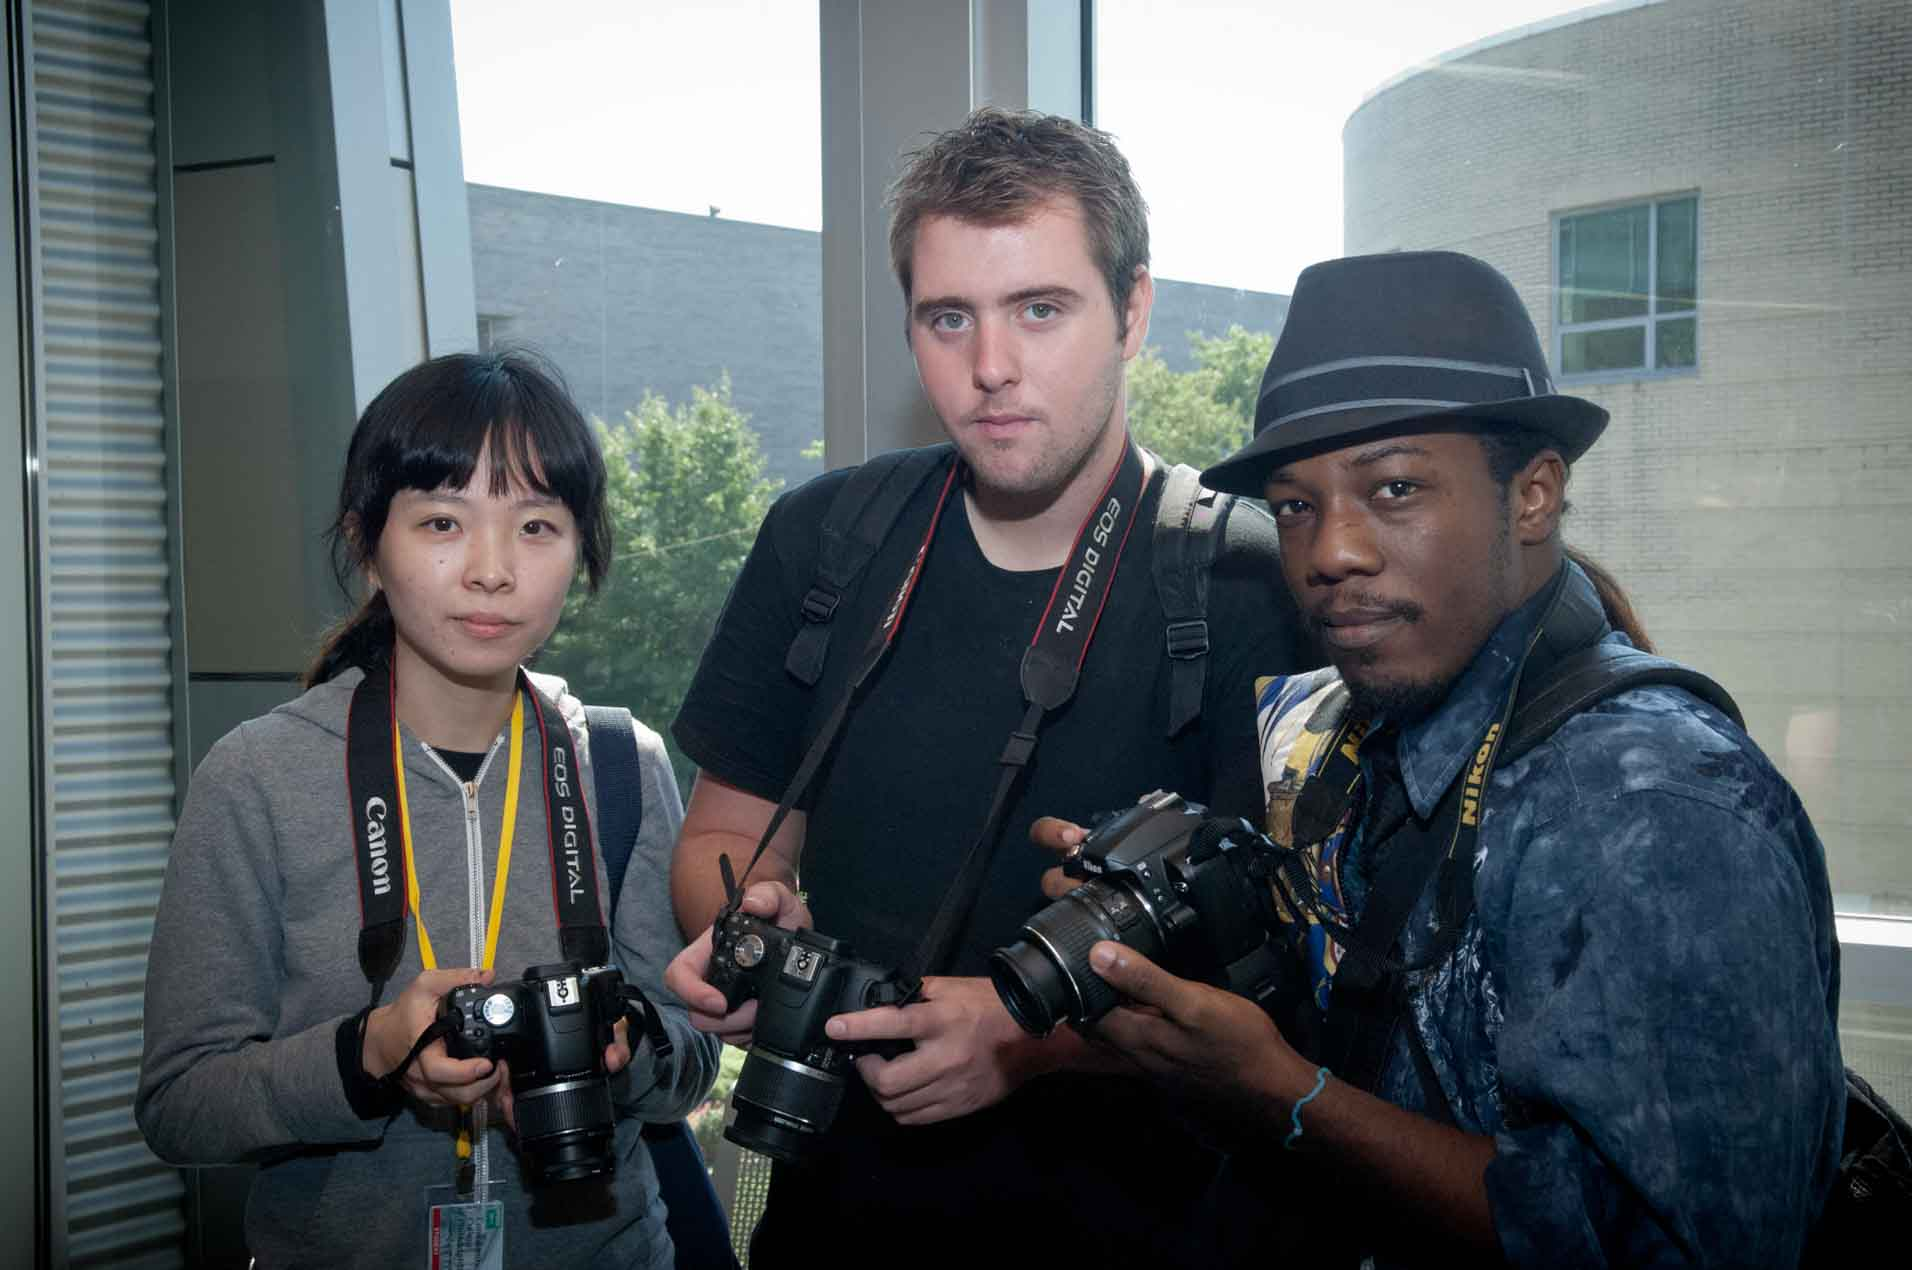 Photographic Imaging | Community College of Philadelphia